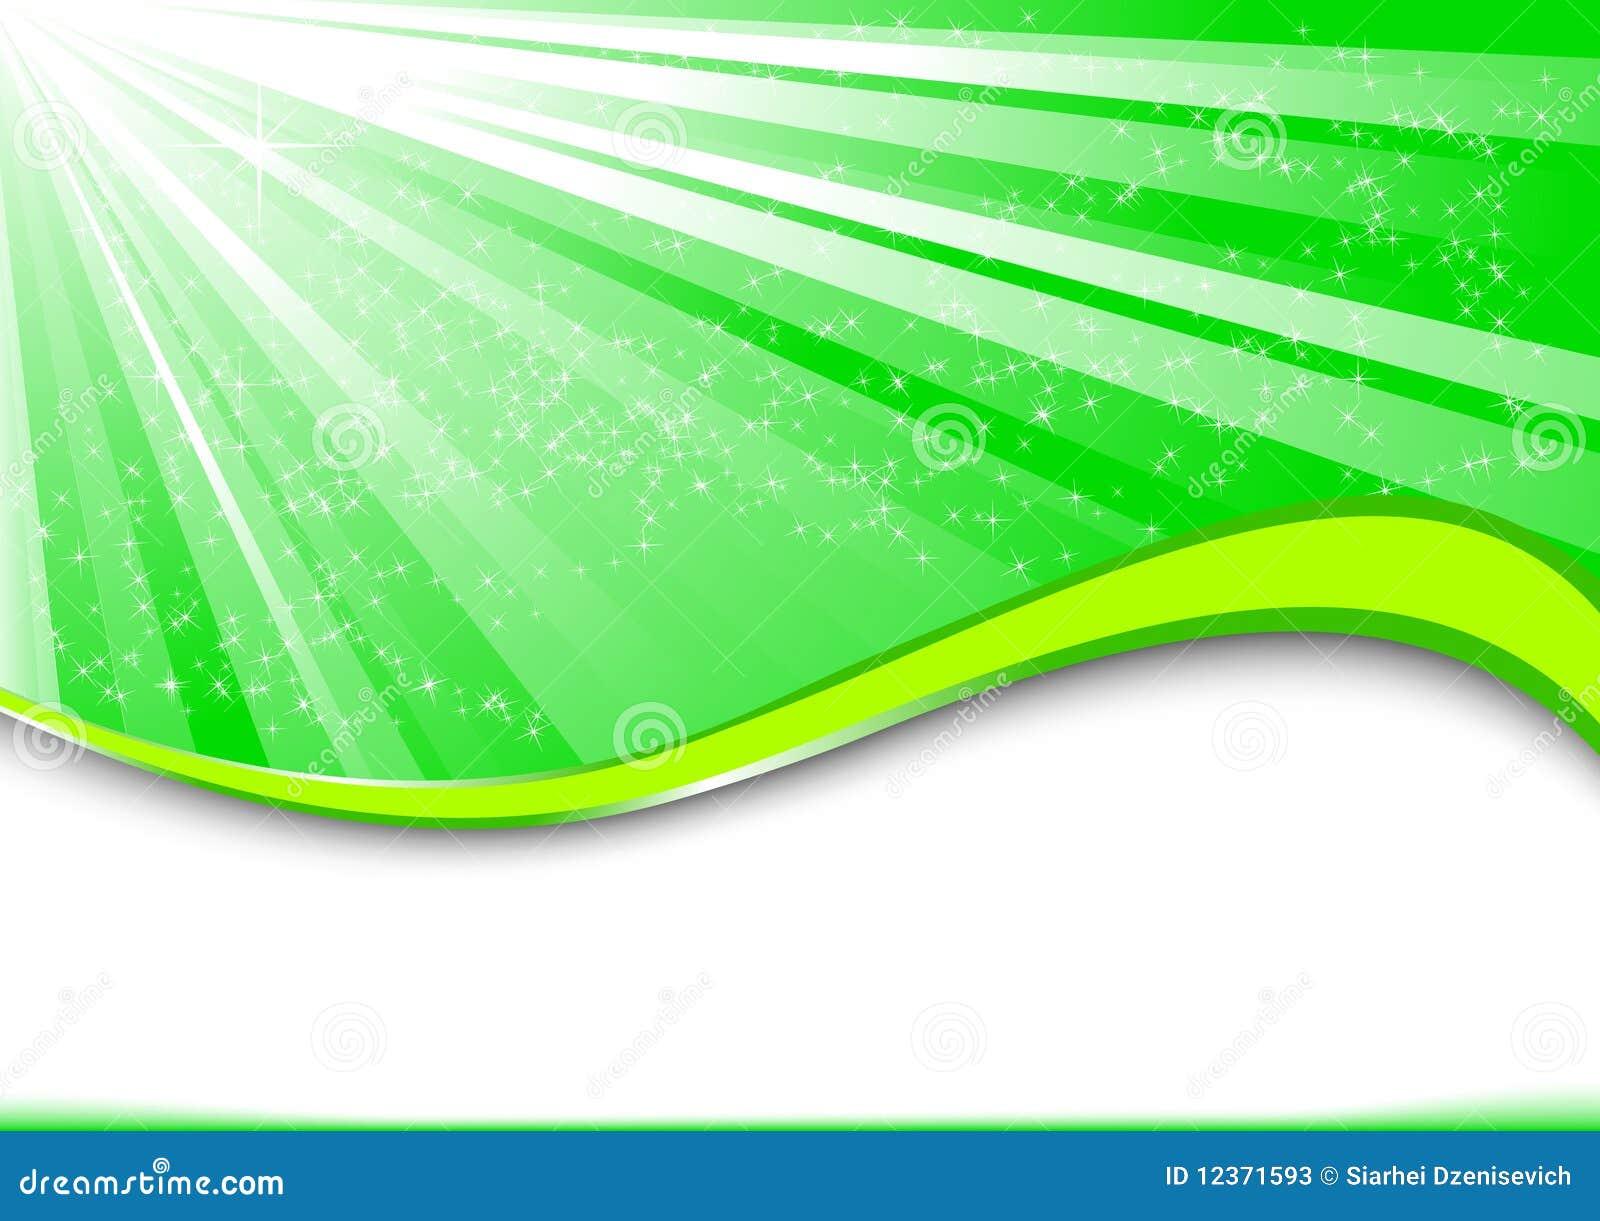 Unduh 40 Background Banner Hijau Full Hd HD Gratis